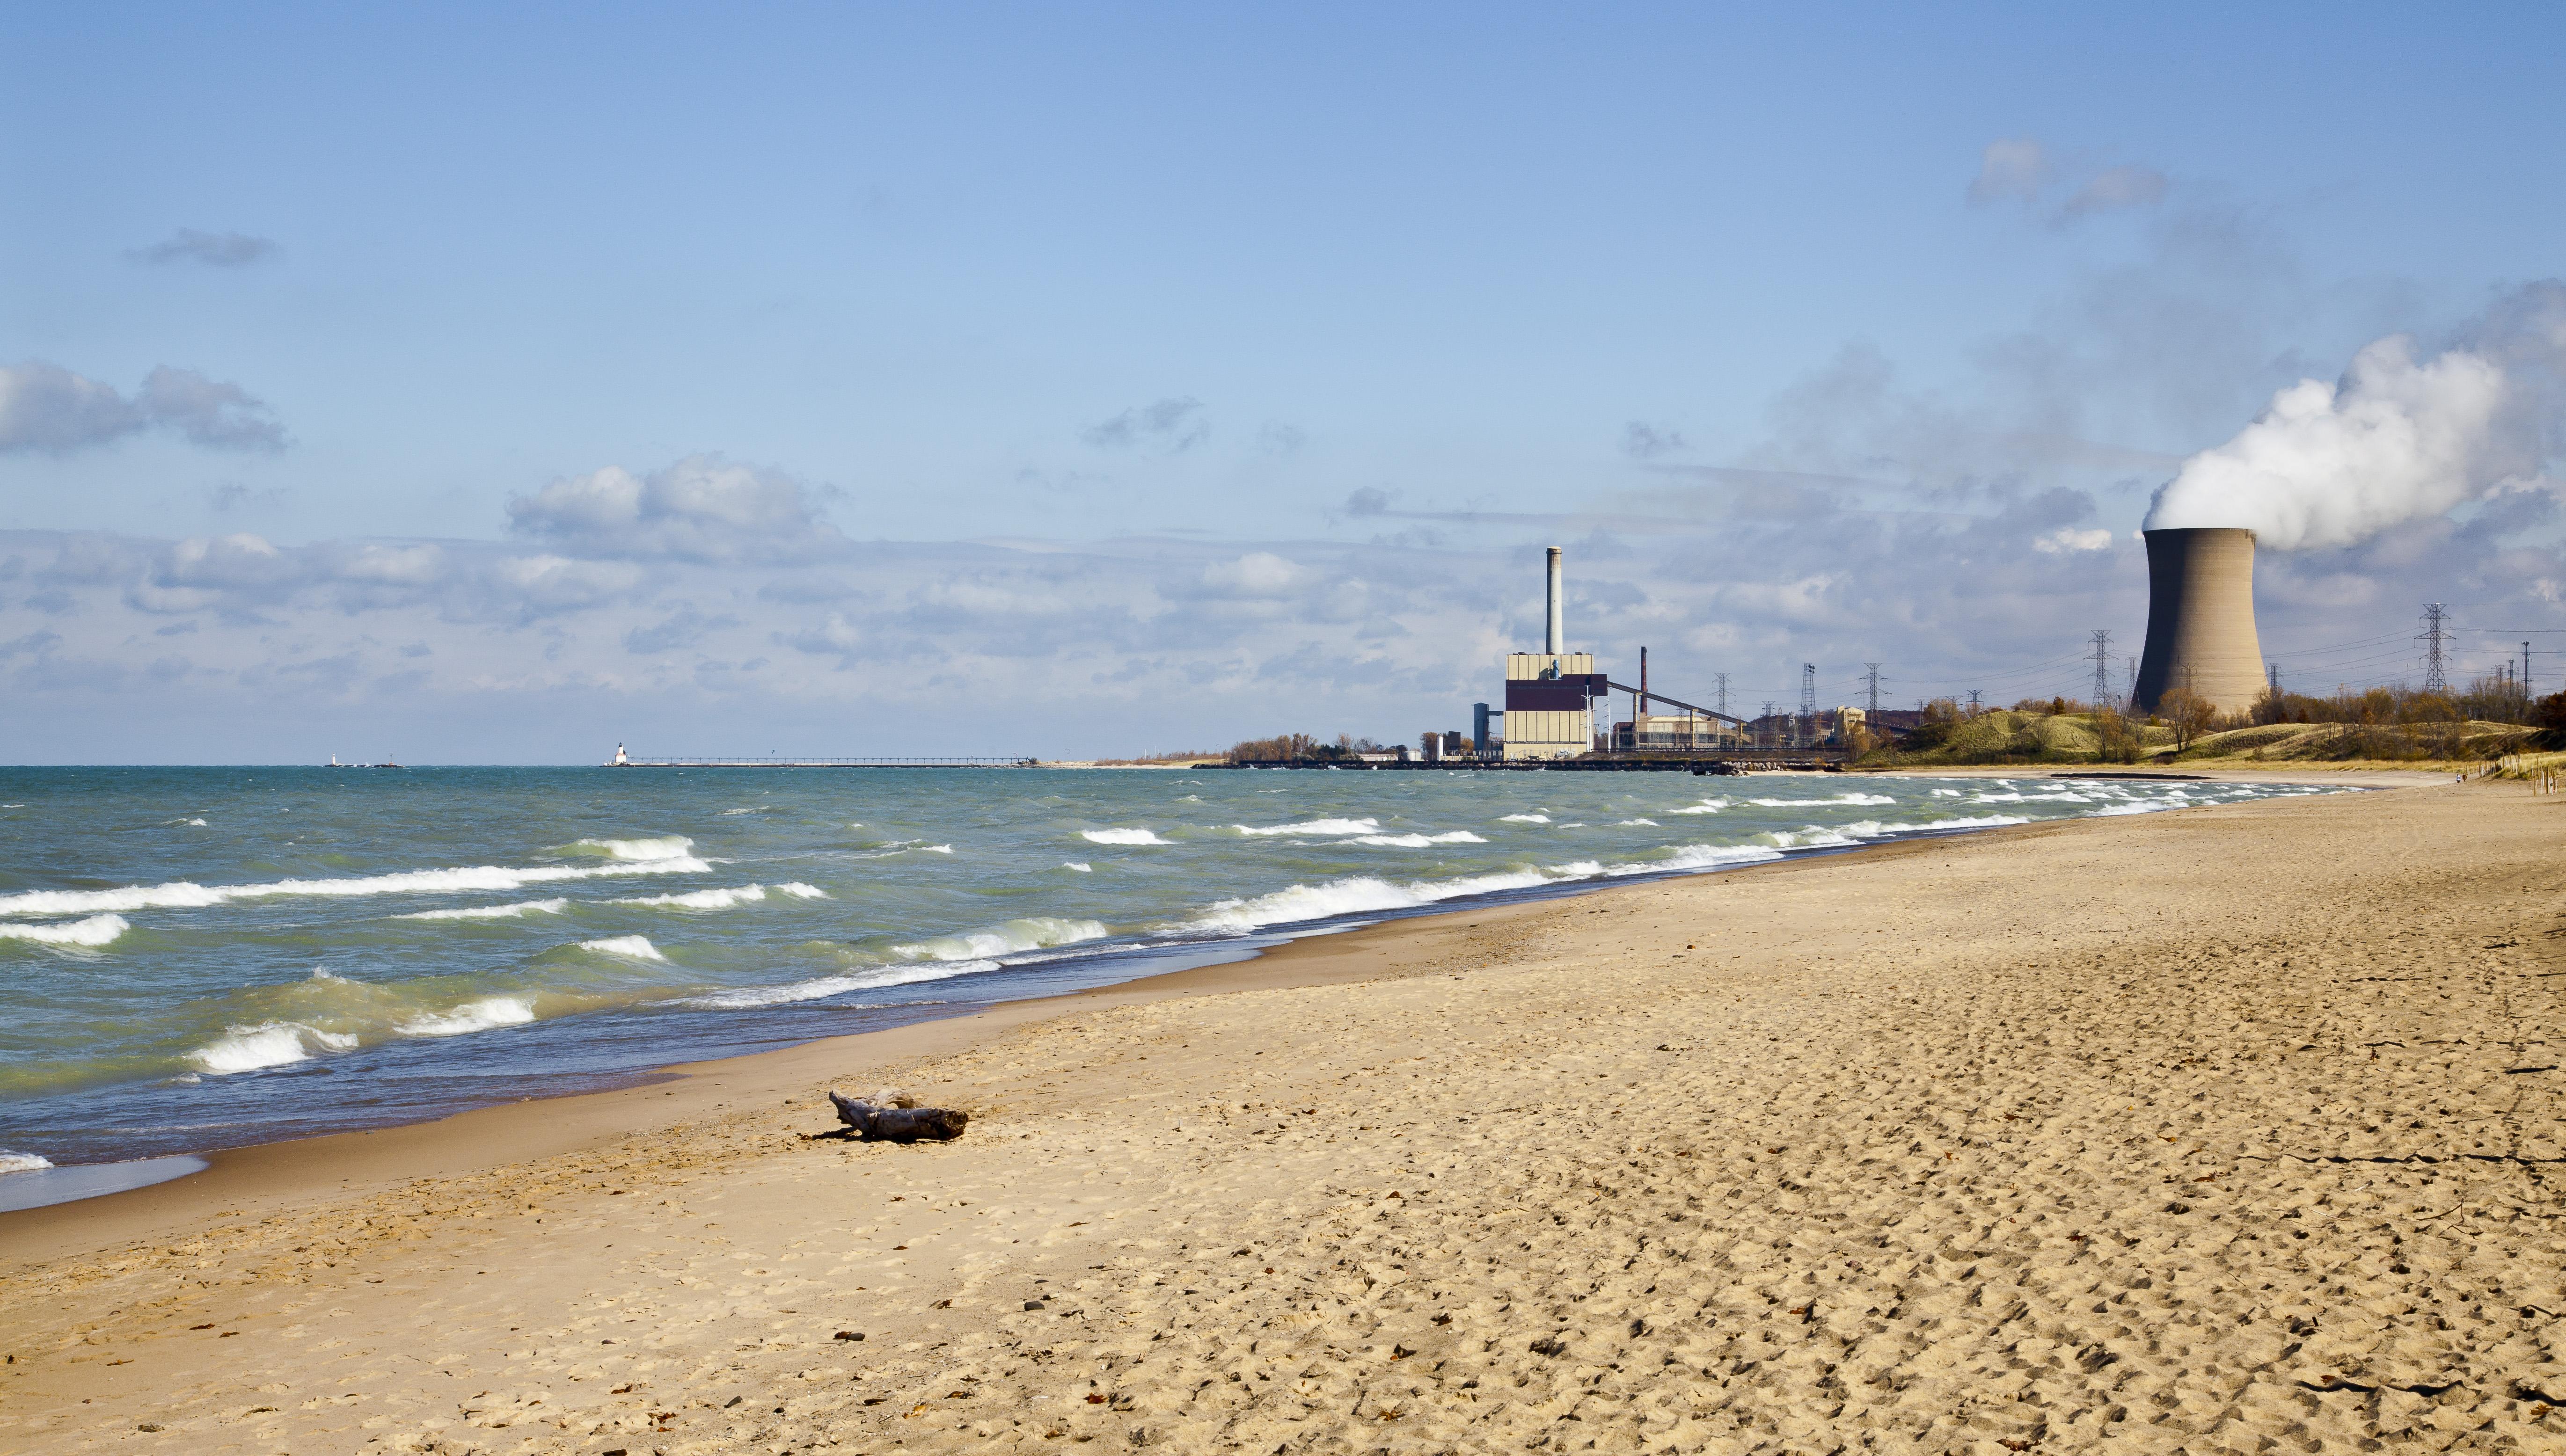 Beach Amd City